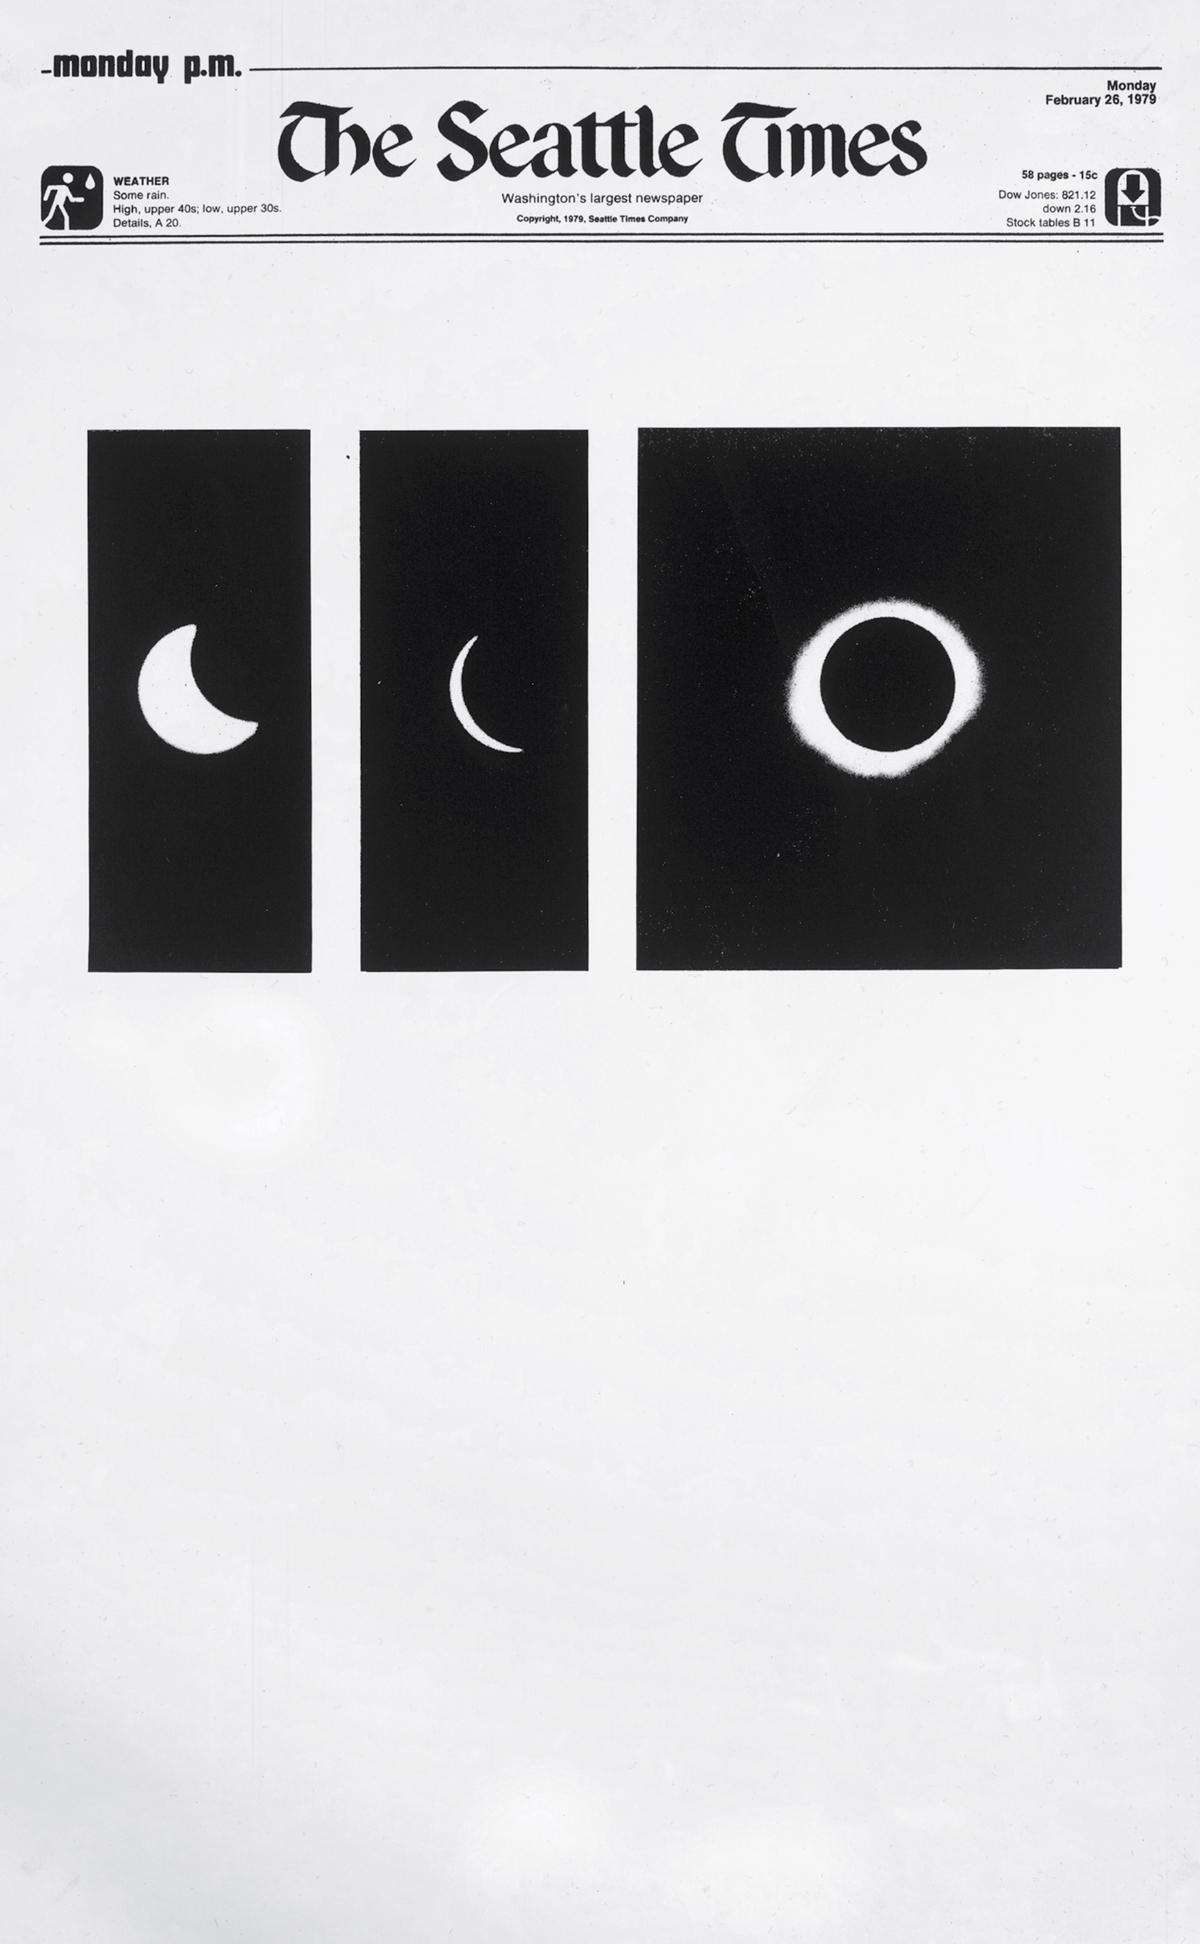 Sarah Charlesworth, 'Arc of Total Eclipse, February 26, 1979' (detail), 1979/2010.